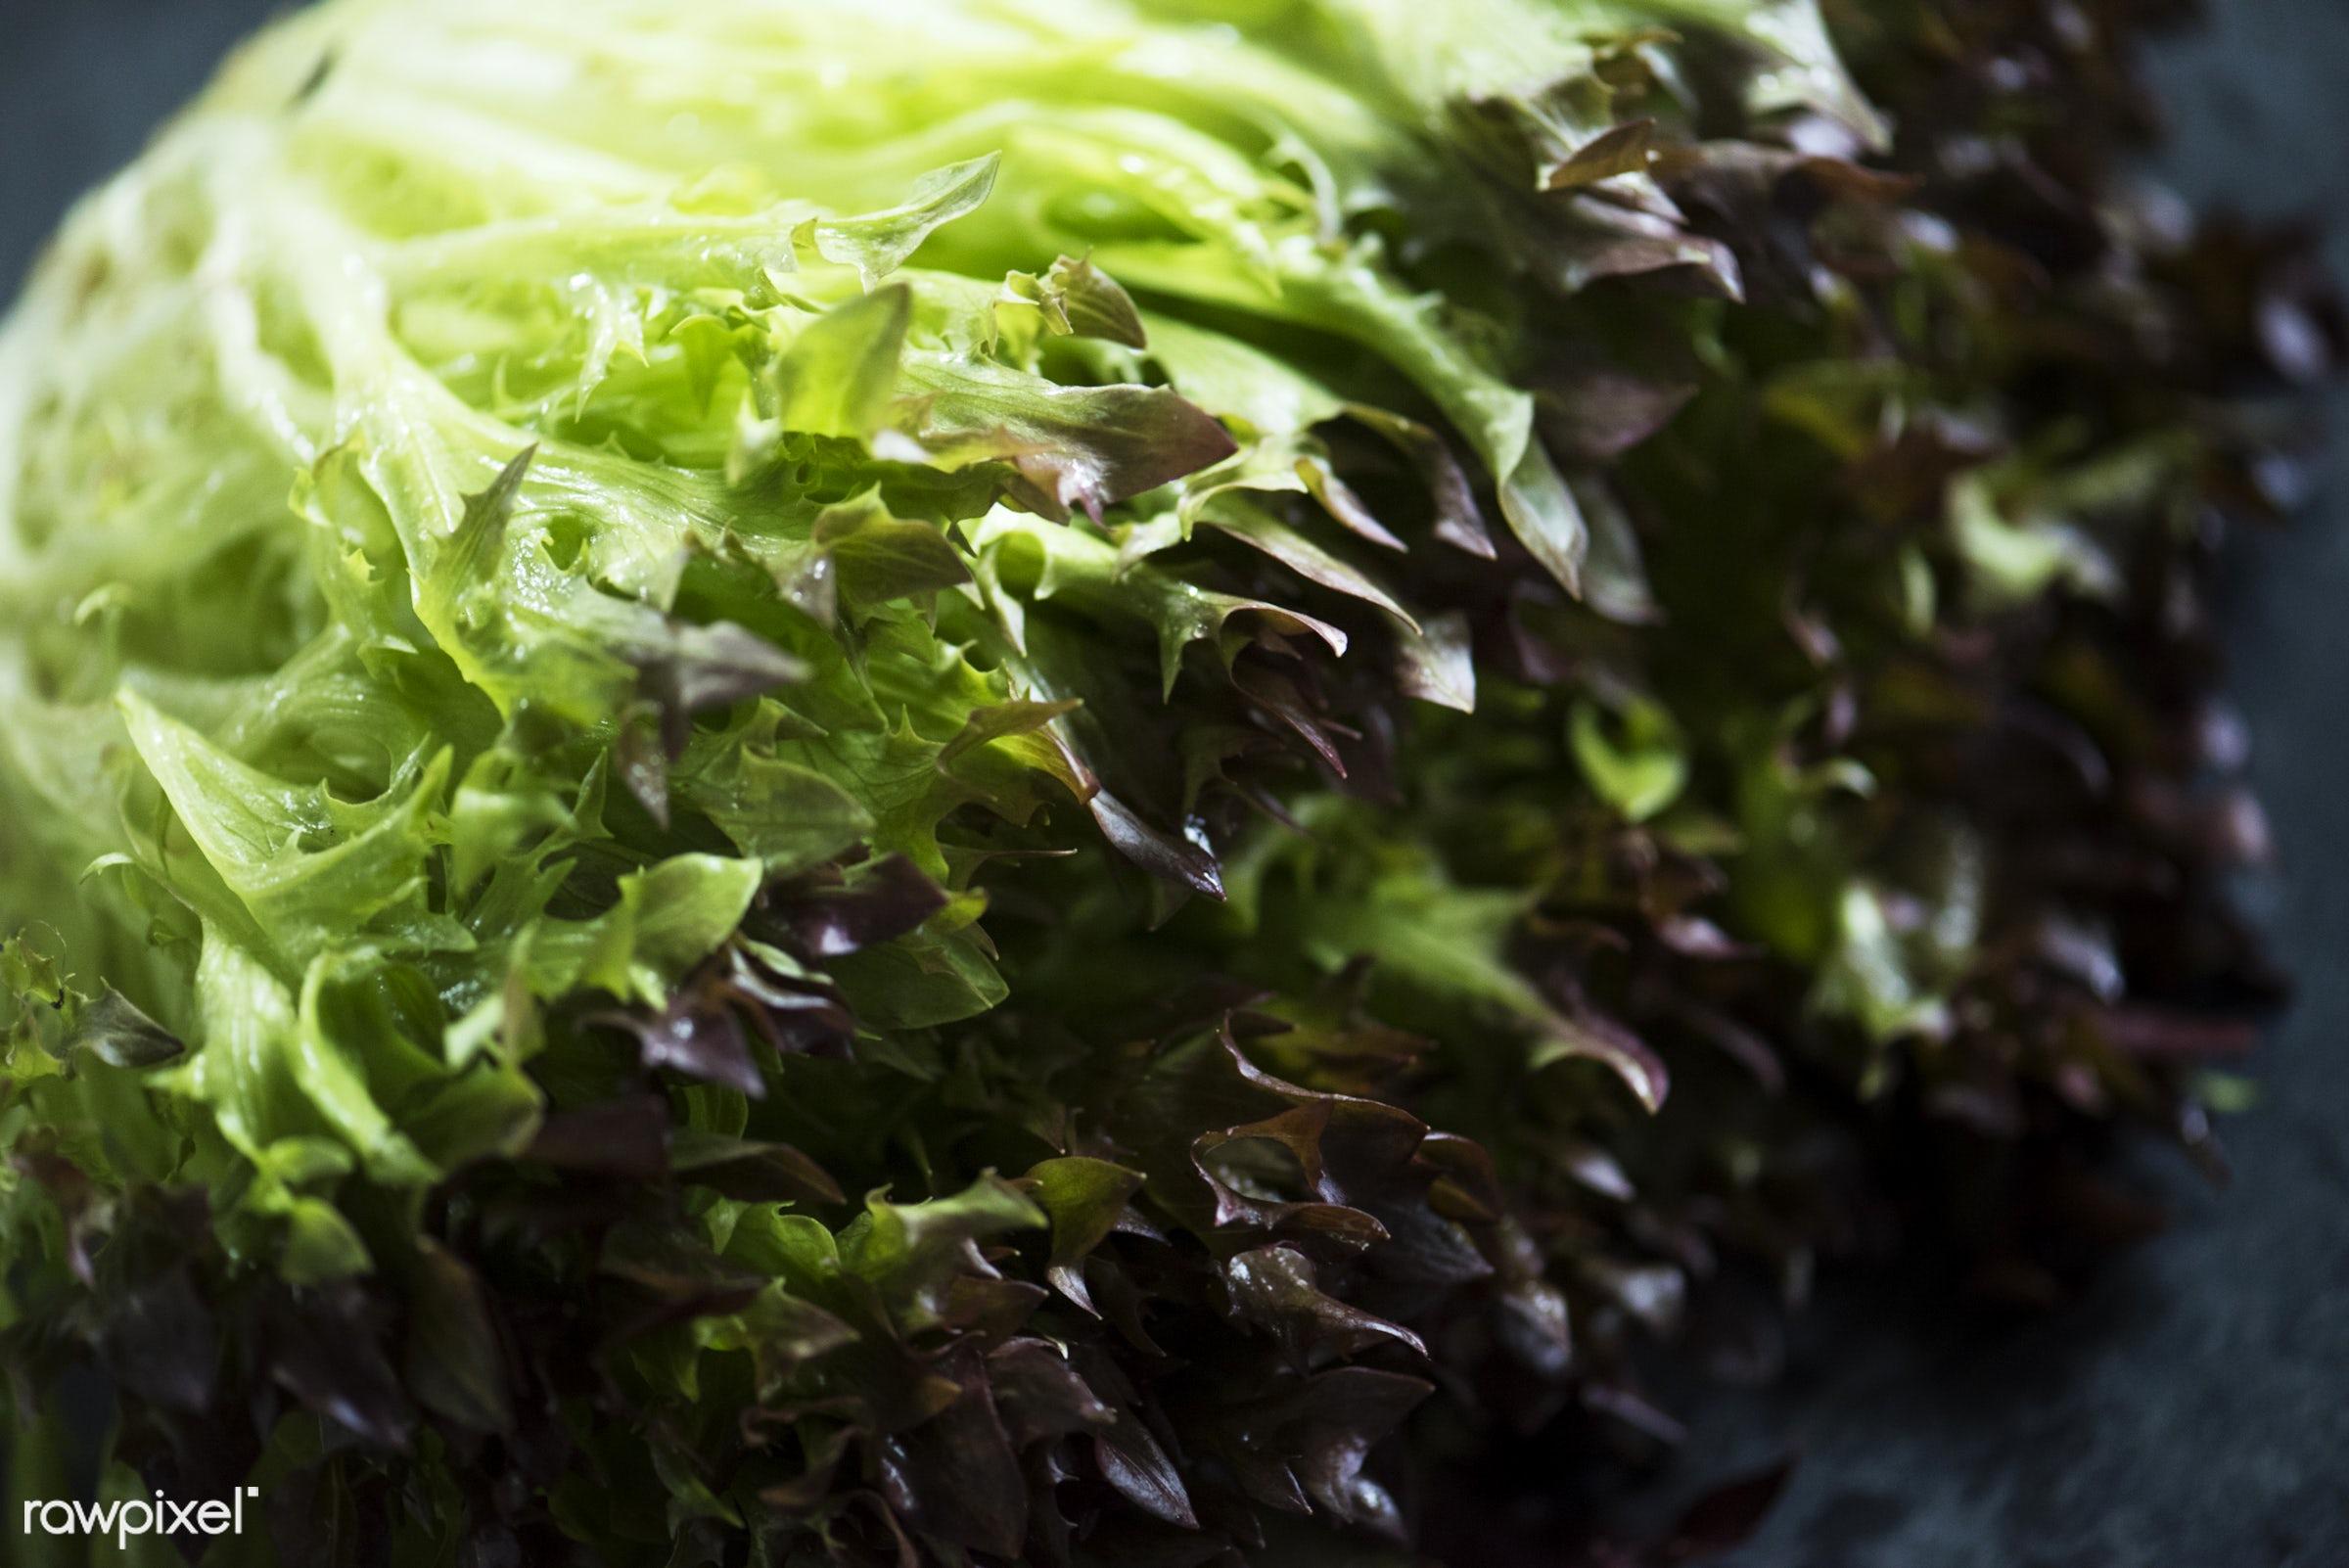 raw, green, culinary, veggies, fiber, edible, organic, nutrition, fresh, food, healthy, ingredient, vegetable, natural